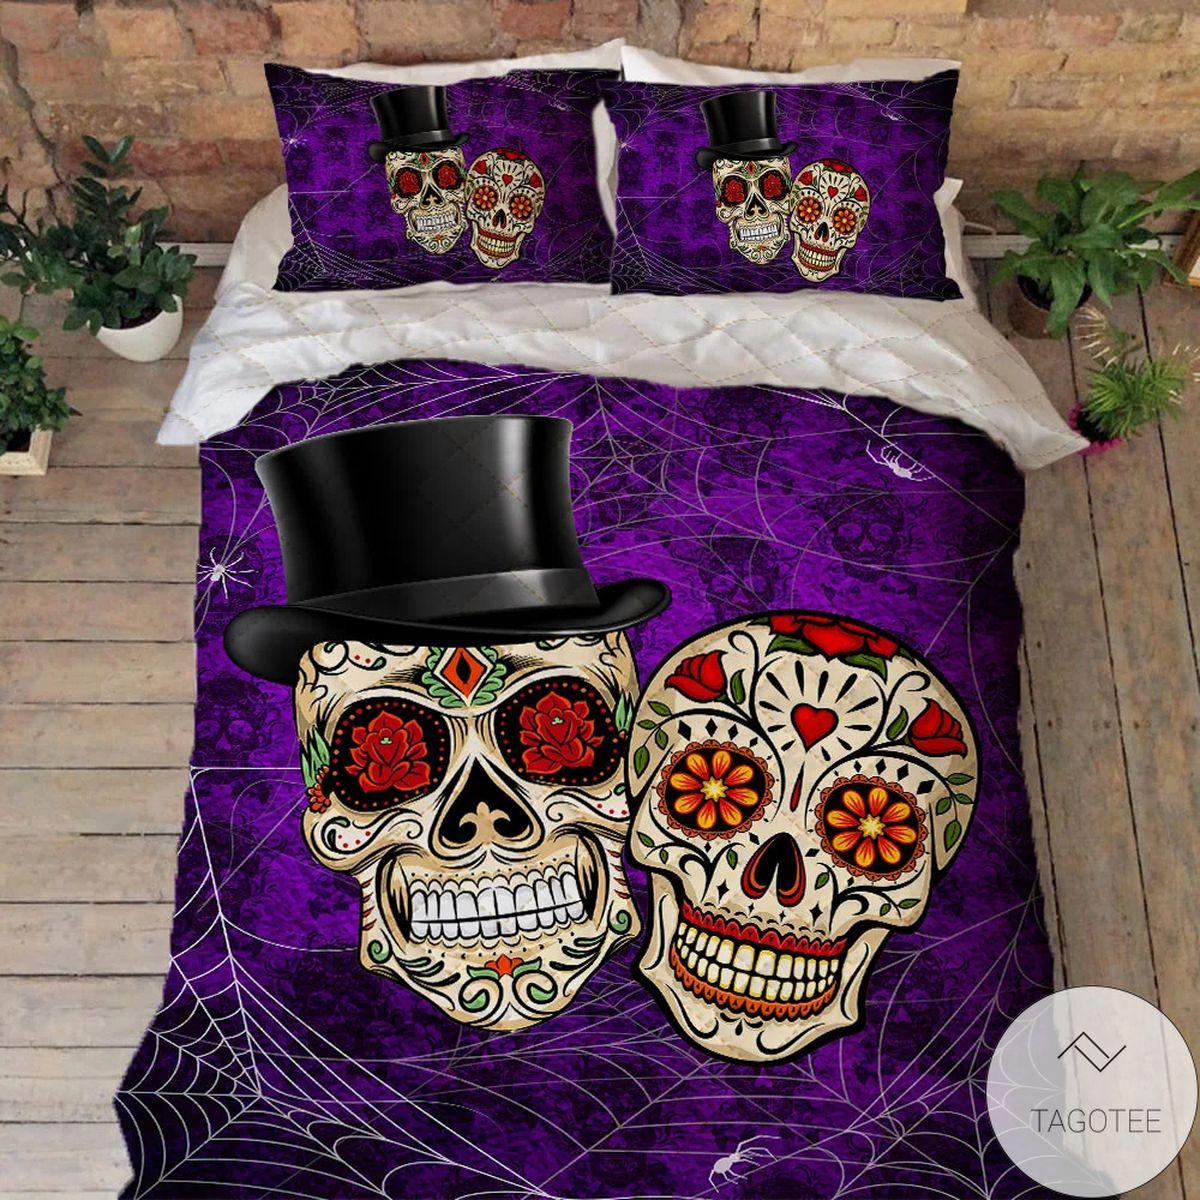 New Happy Haunting Sugar Skull Halloween Quilt Bedding Set